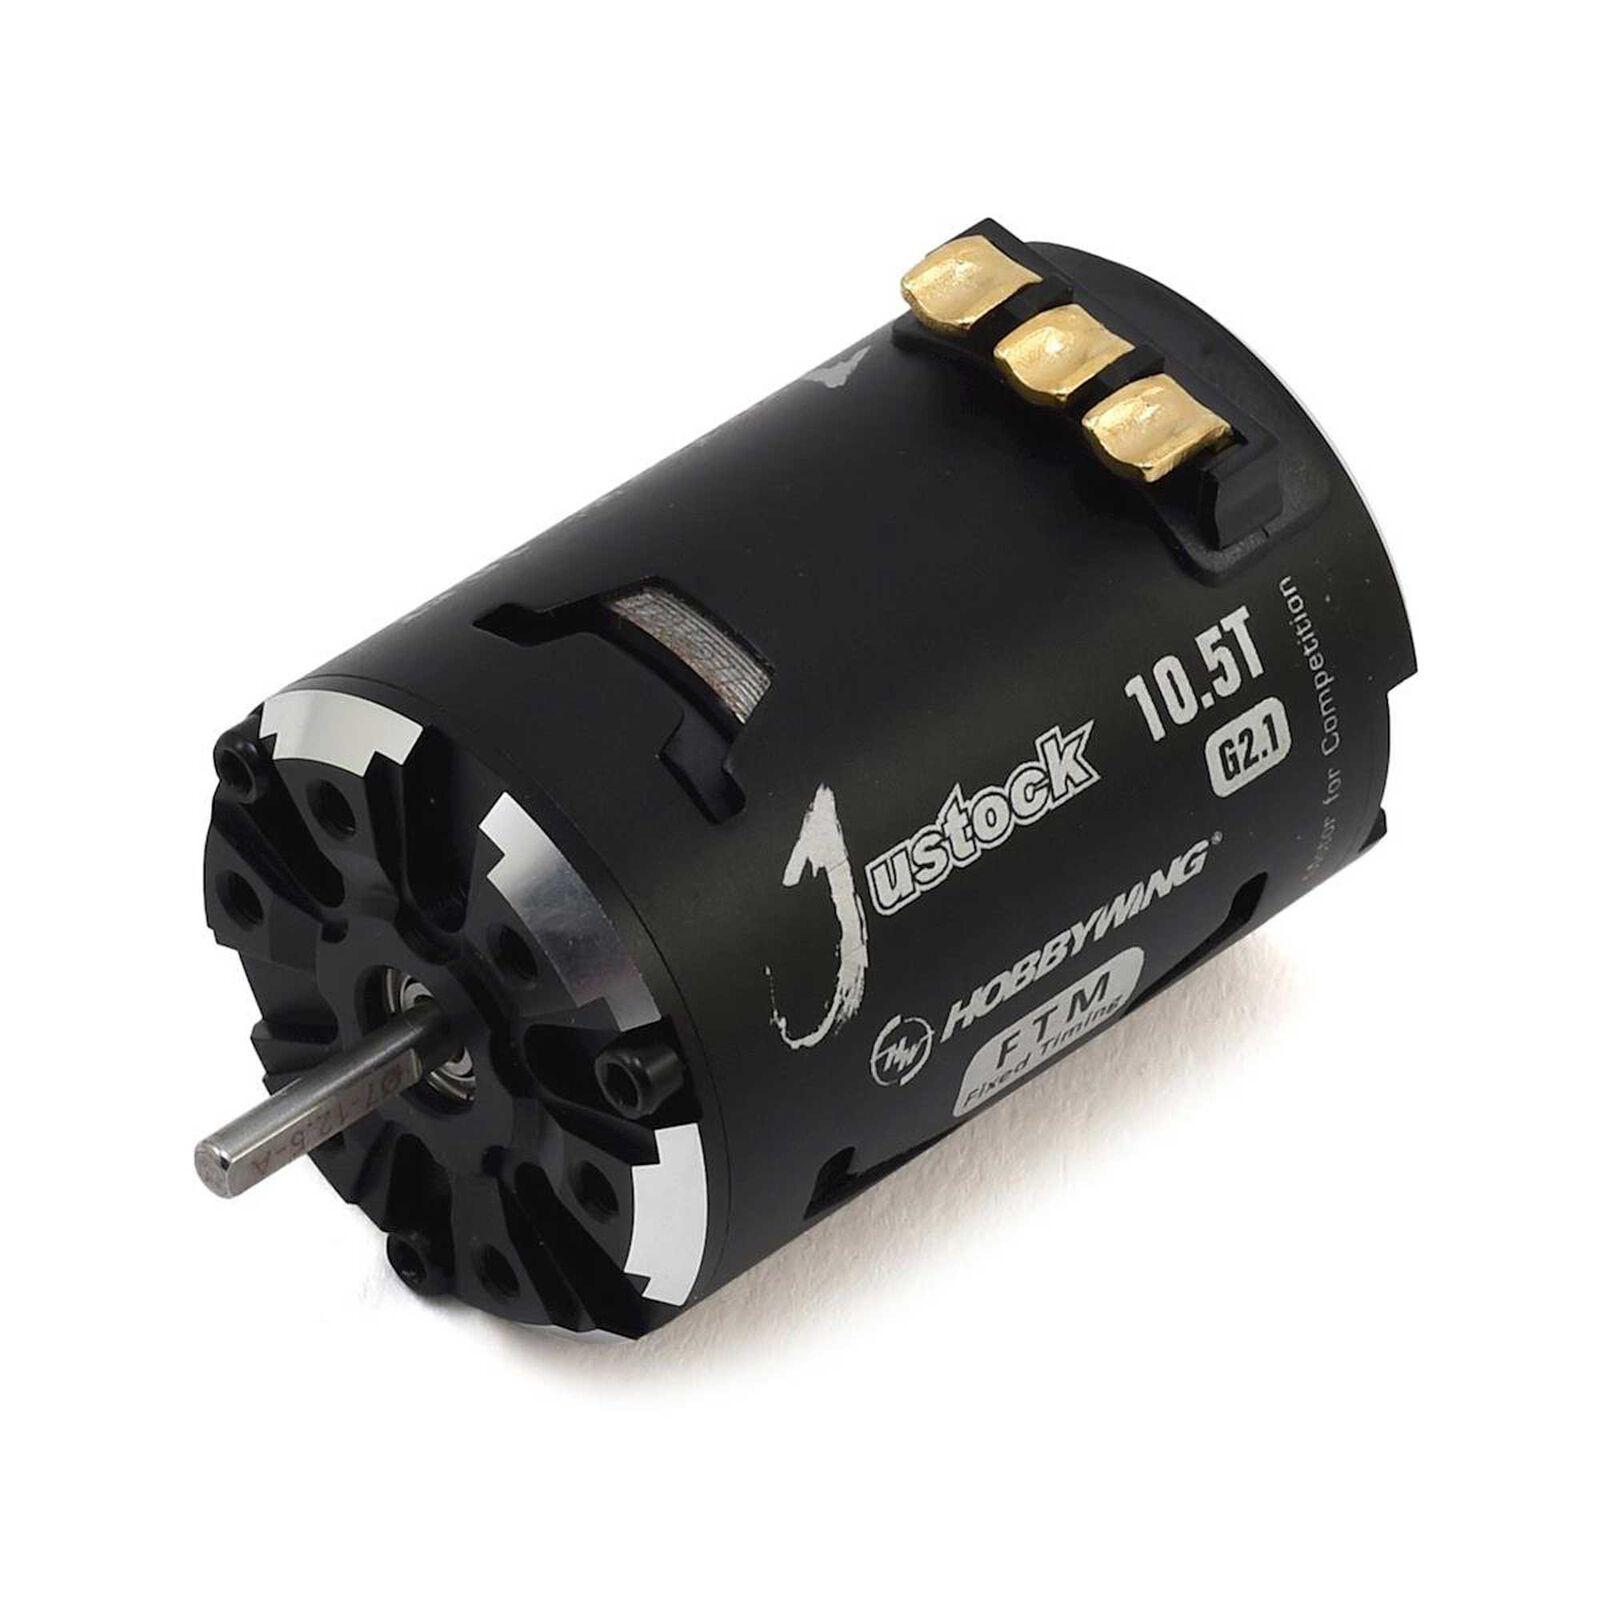 Justock Fixed Timing Motor, 10.5